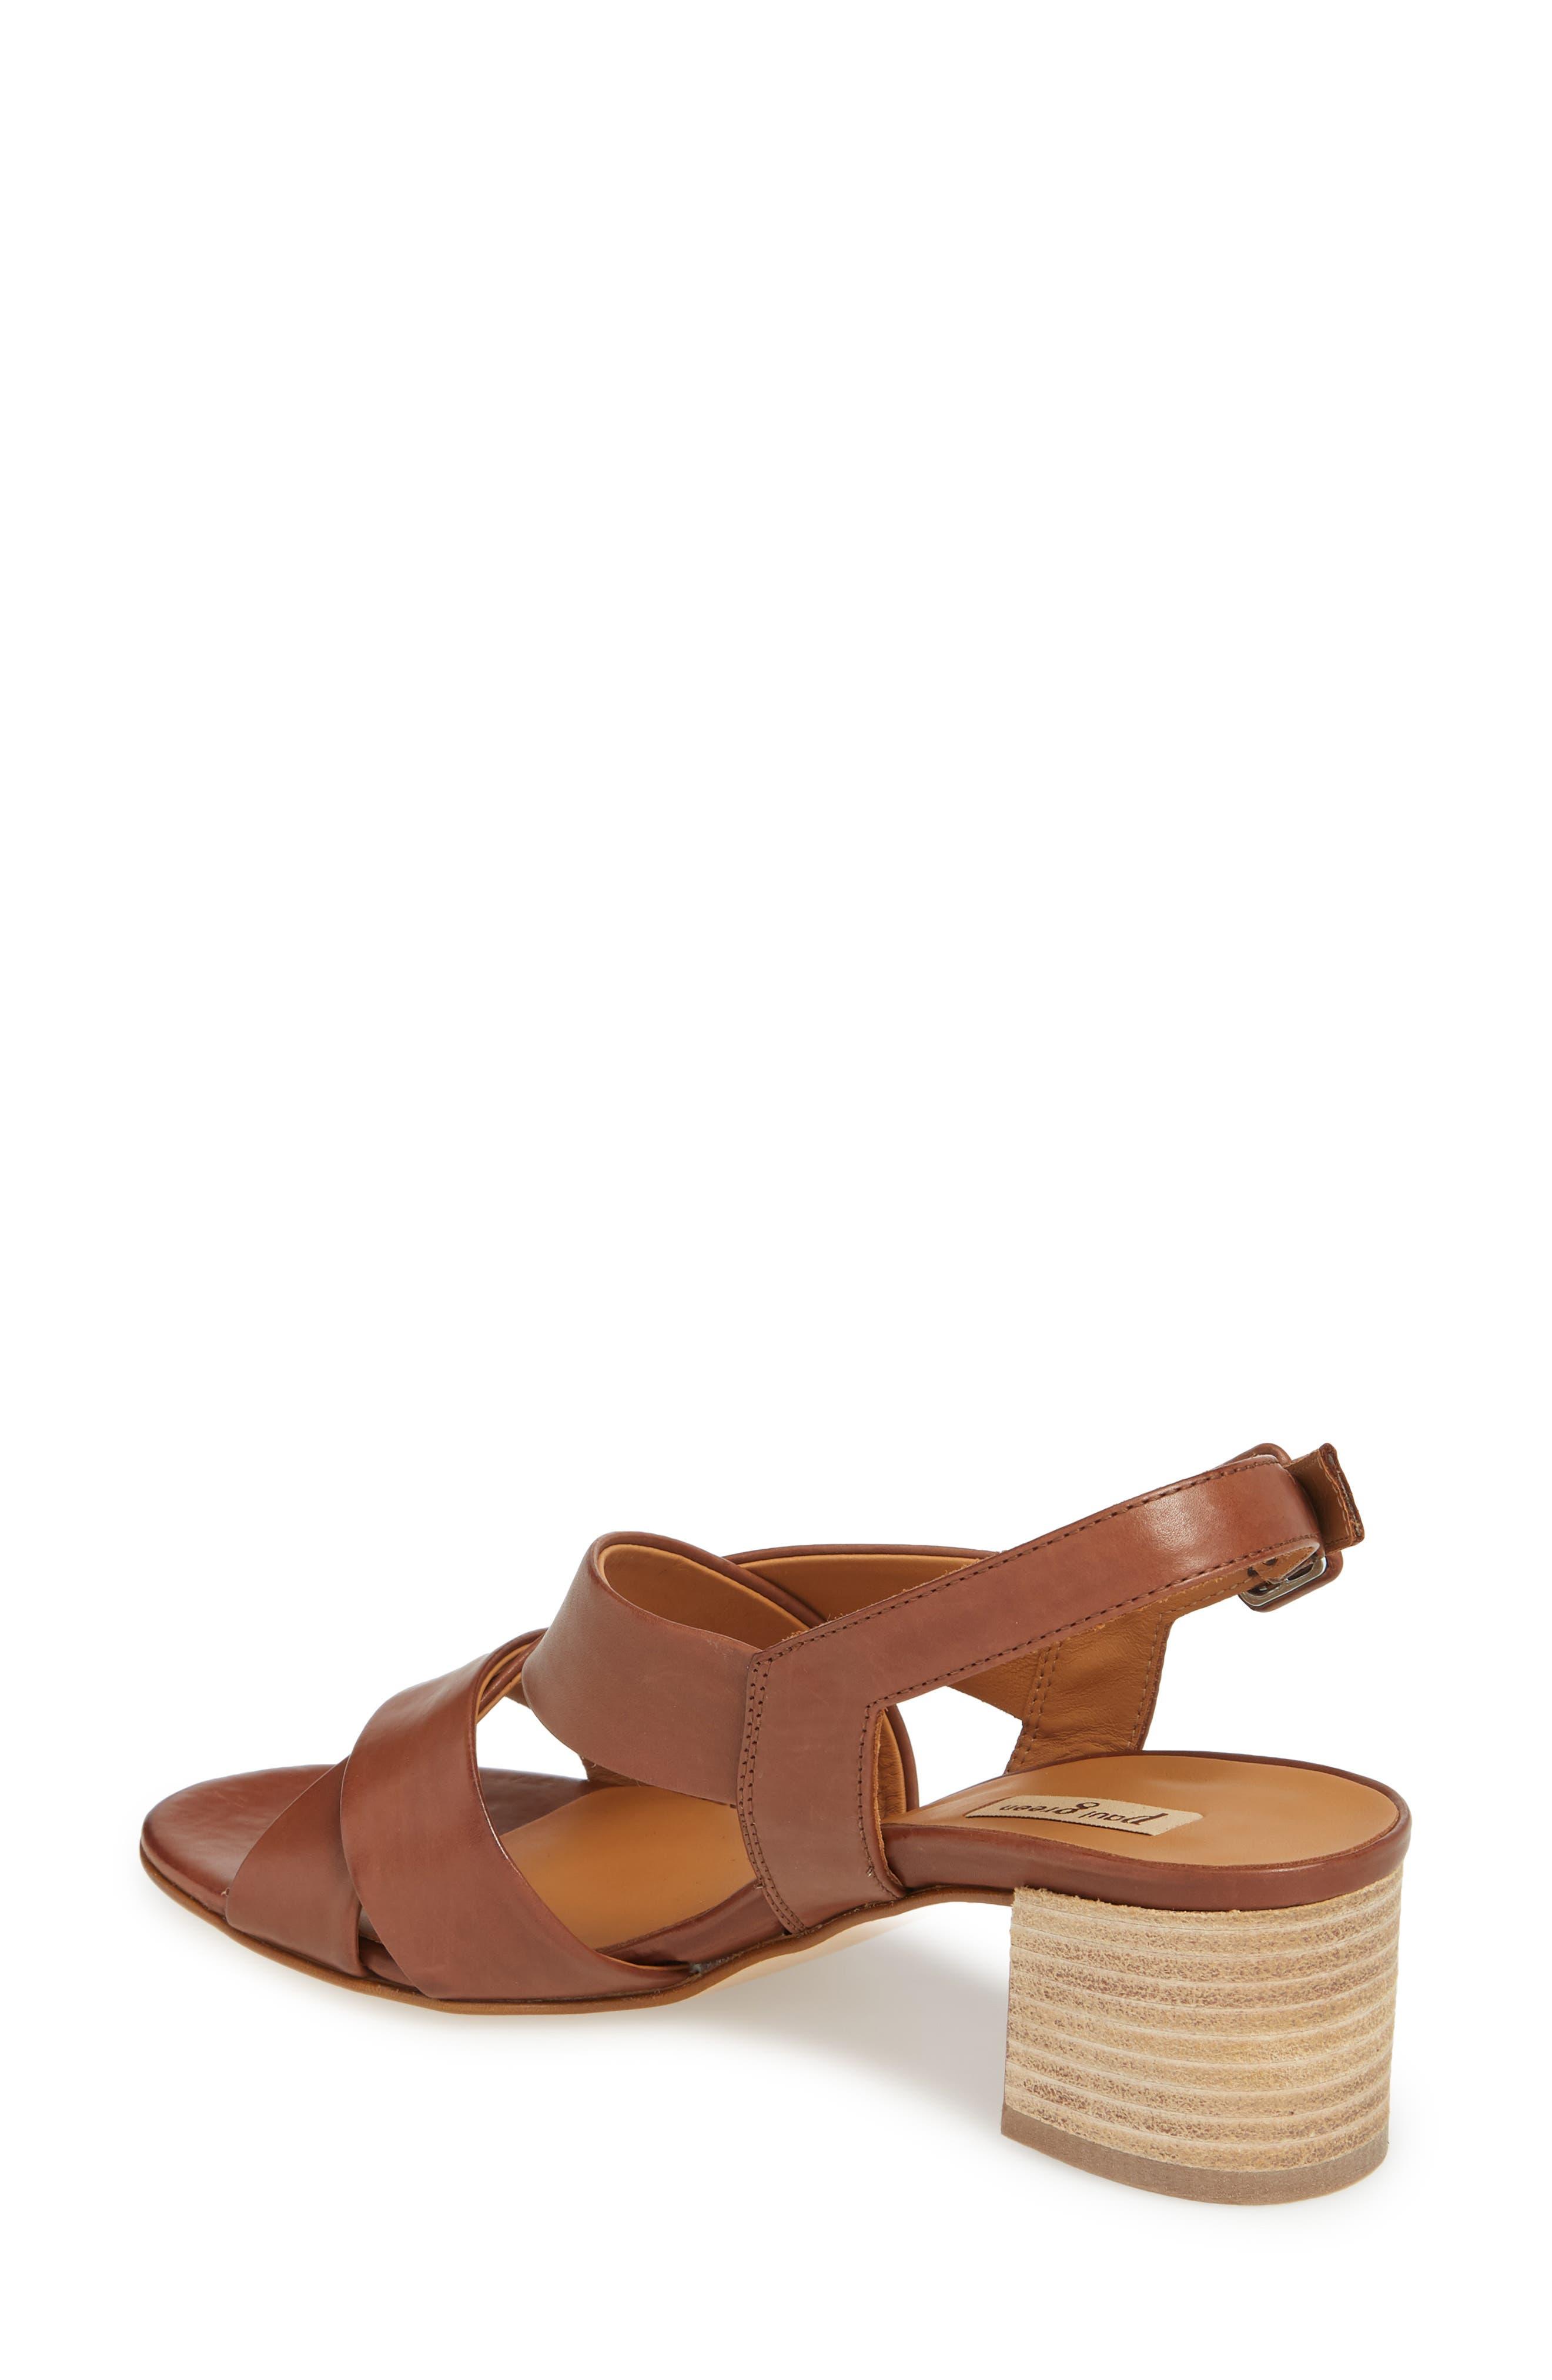 Reese Slingback Sandal,                             Alternate thumbnail 2, color,                             Nougat Leather